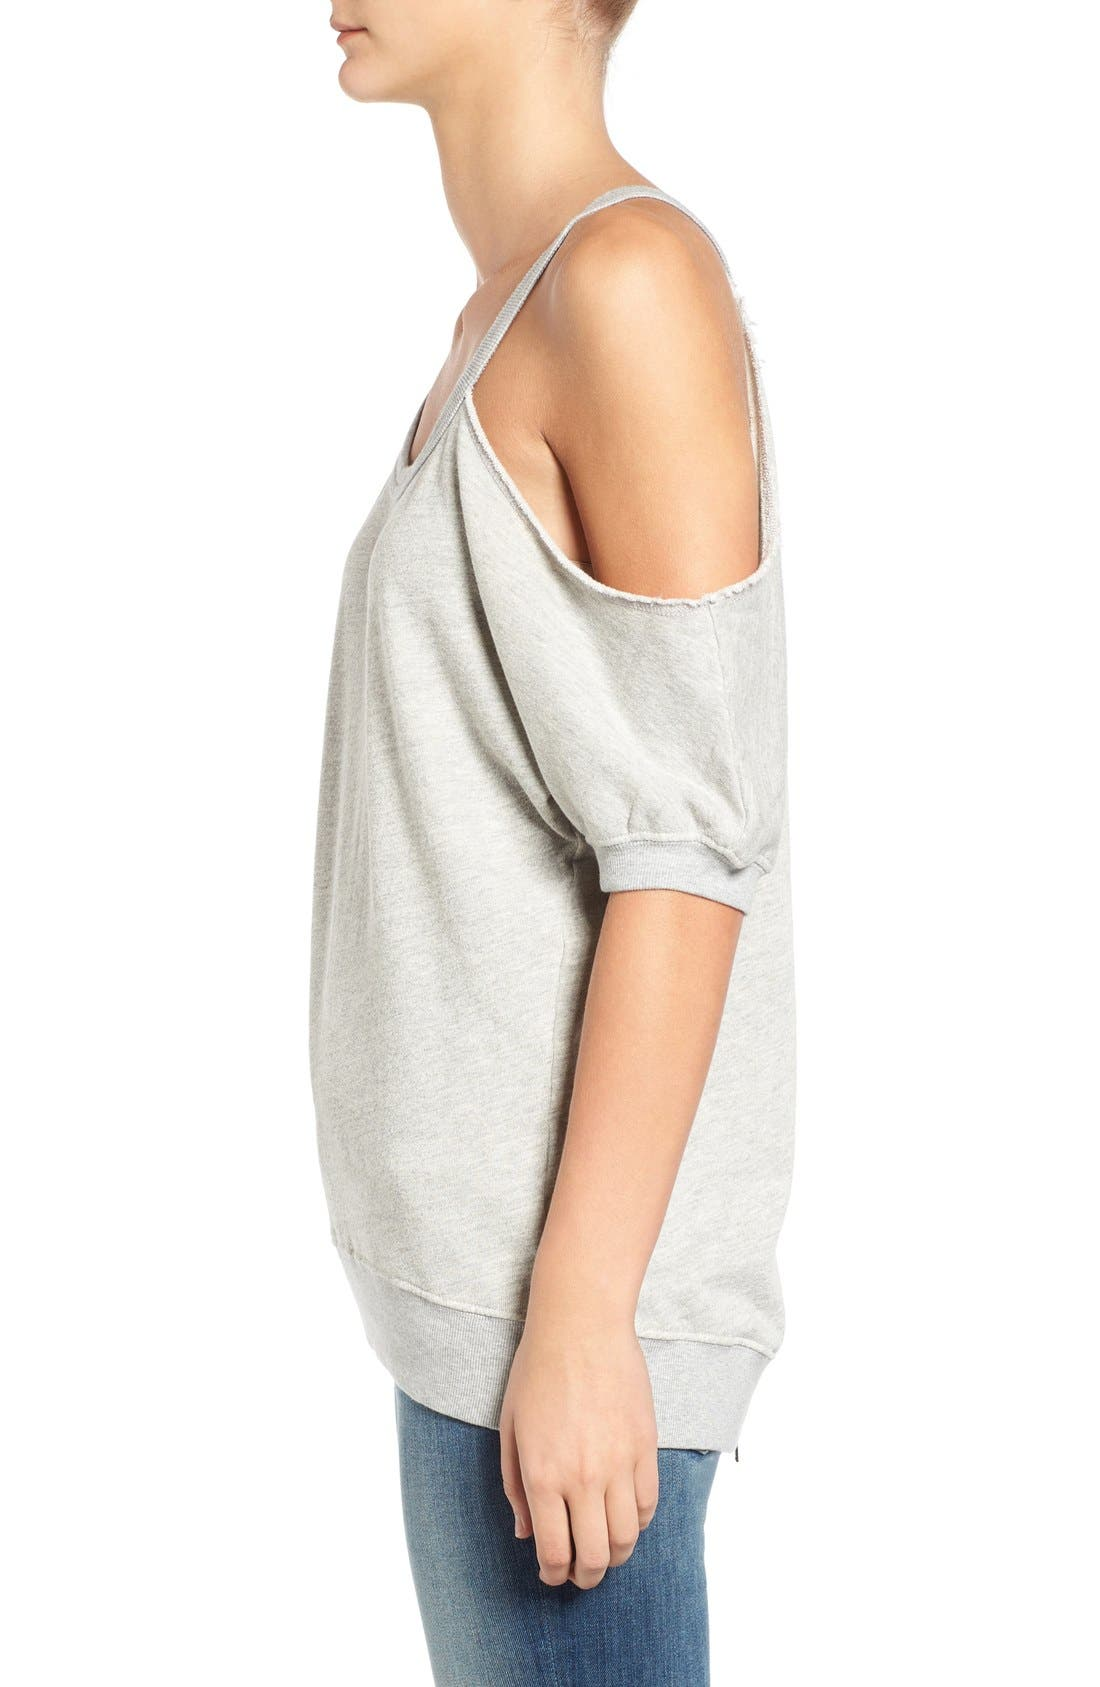 PAM & GELA, Distressed Open Shoulder Sweatshirt, Alternate thumbnail 4, color, 031